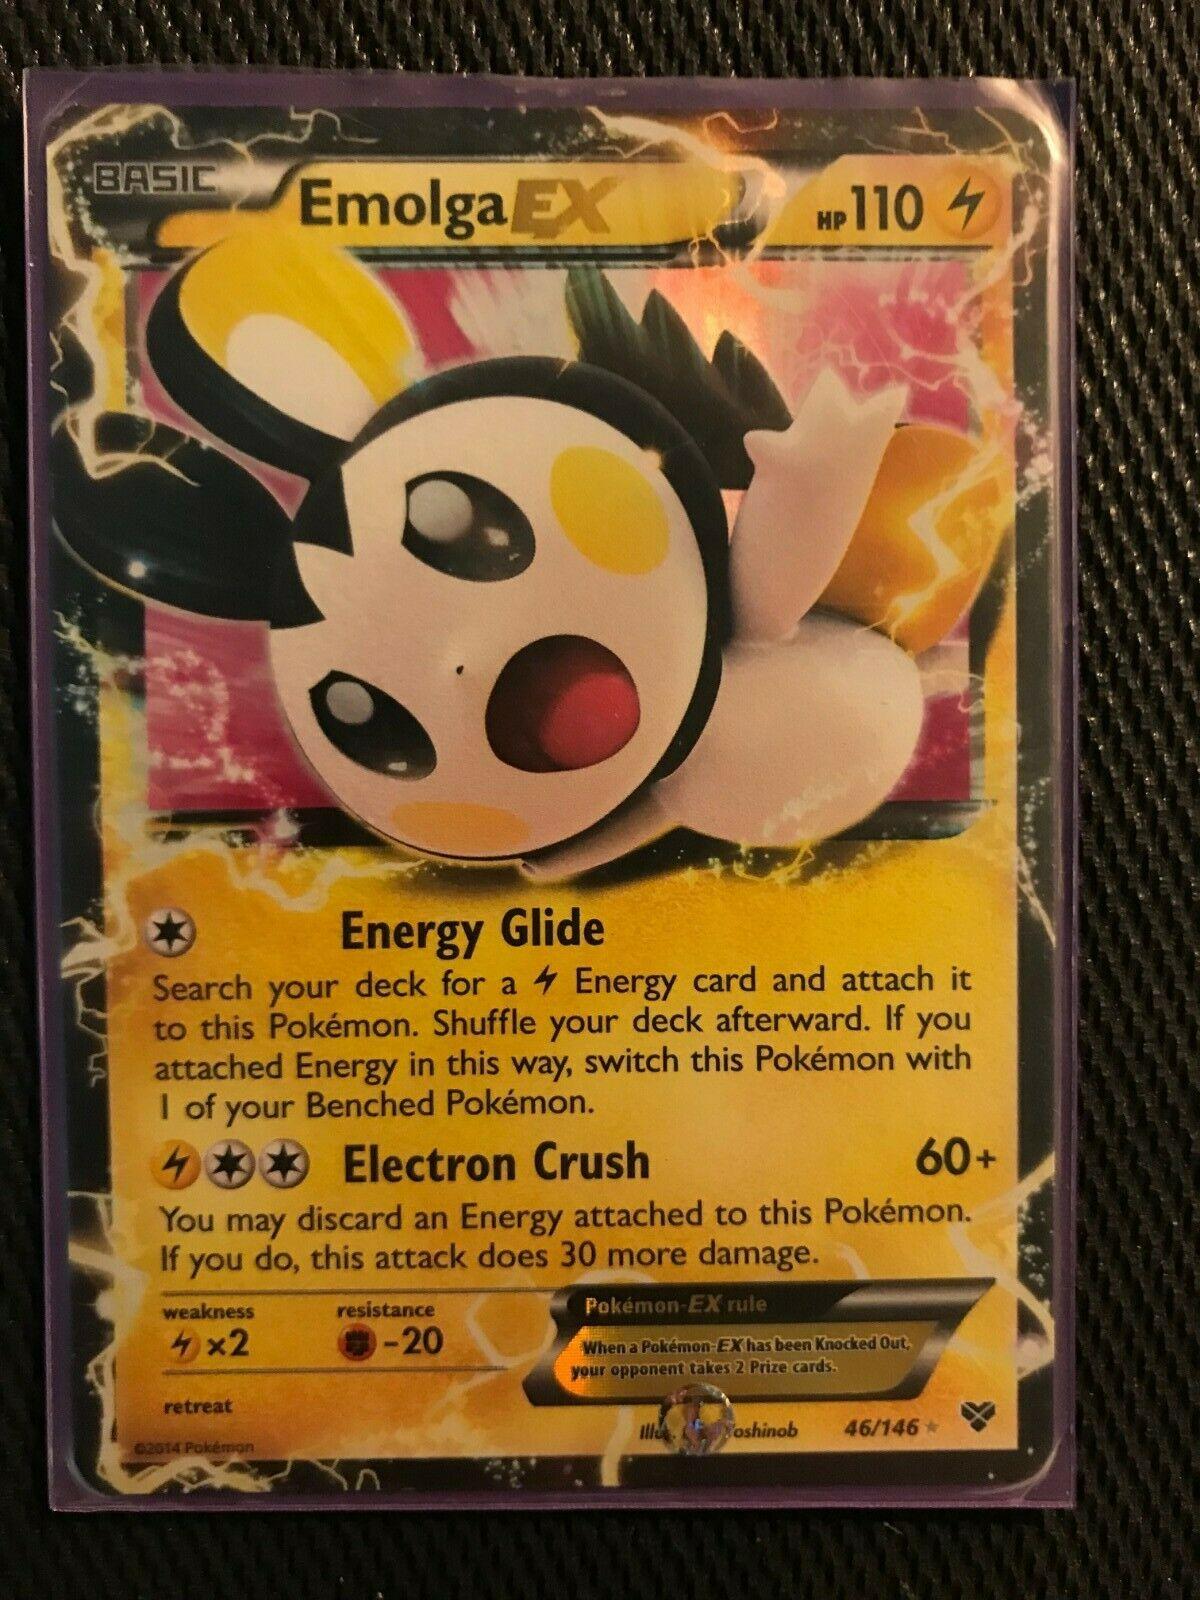 Emolga-EX Ultra Rare Pokemon Card XY Base 46//146